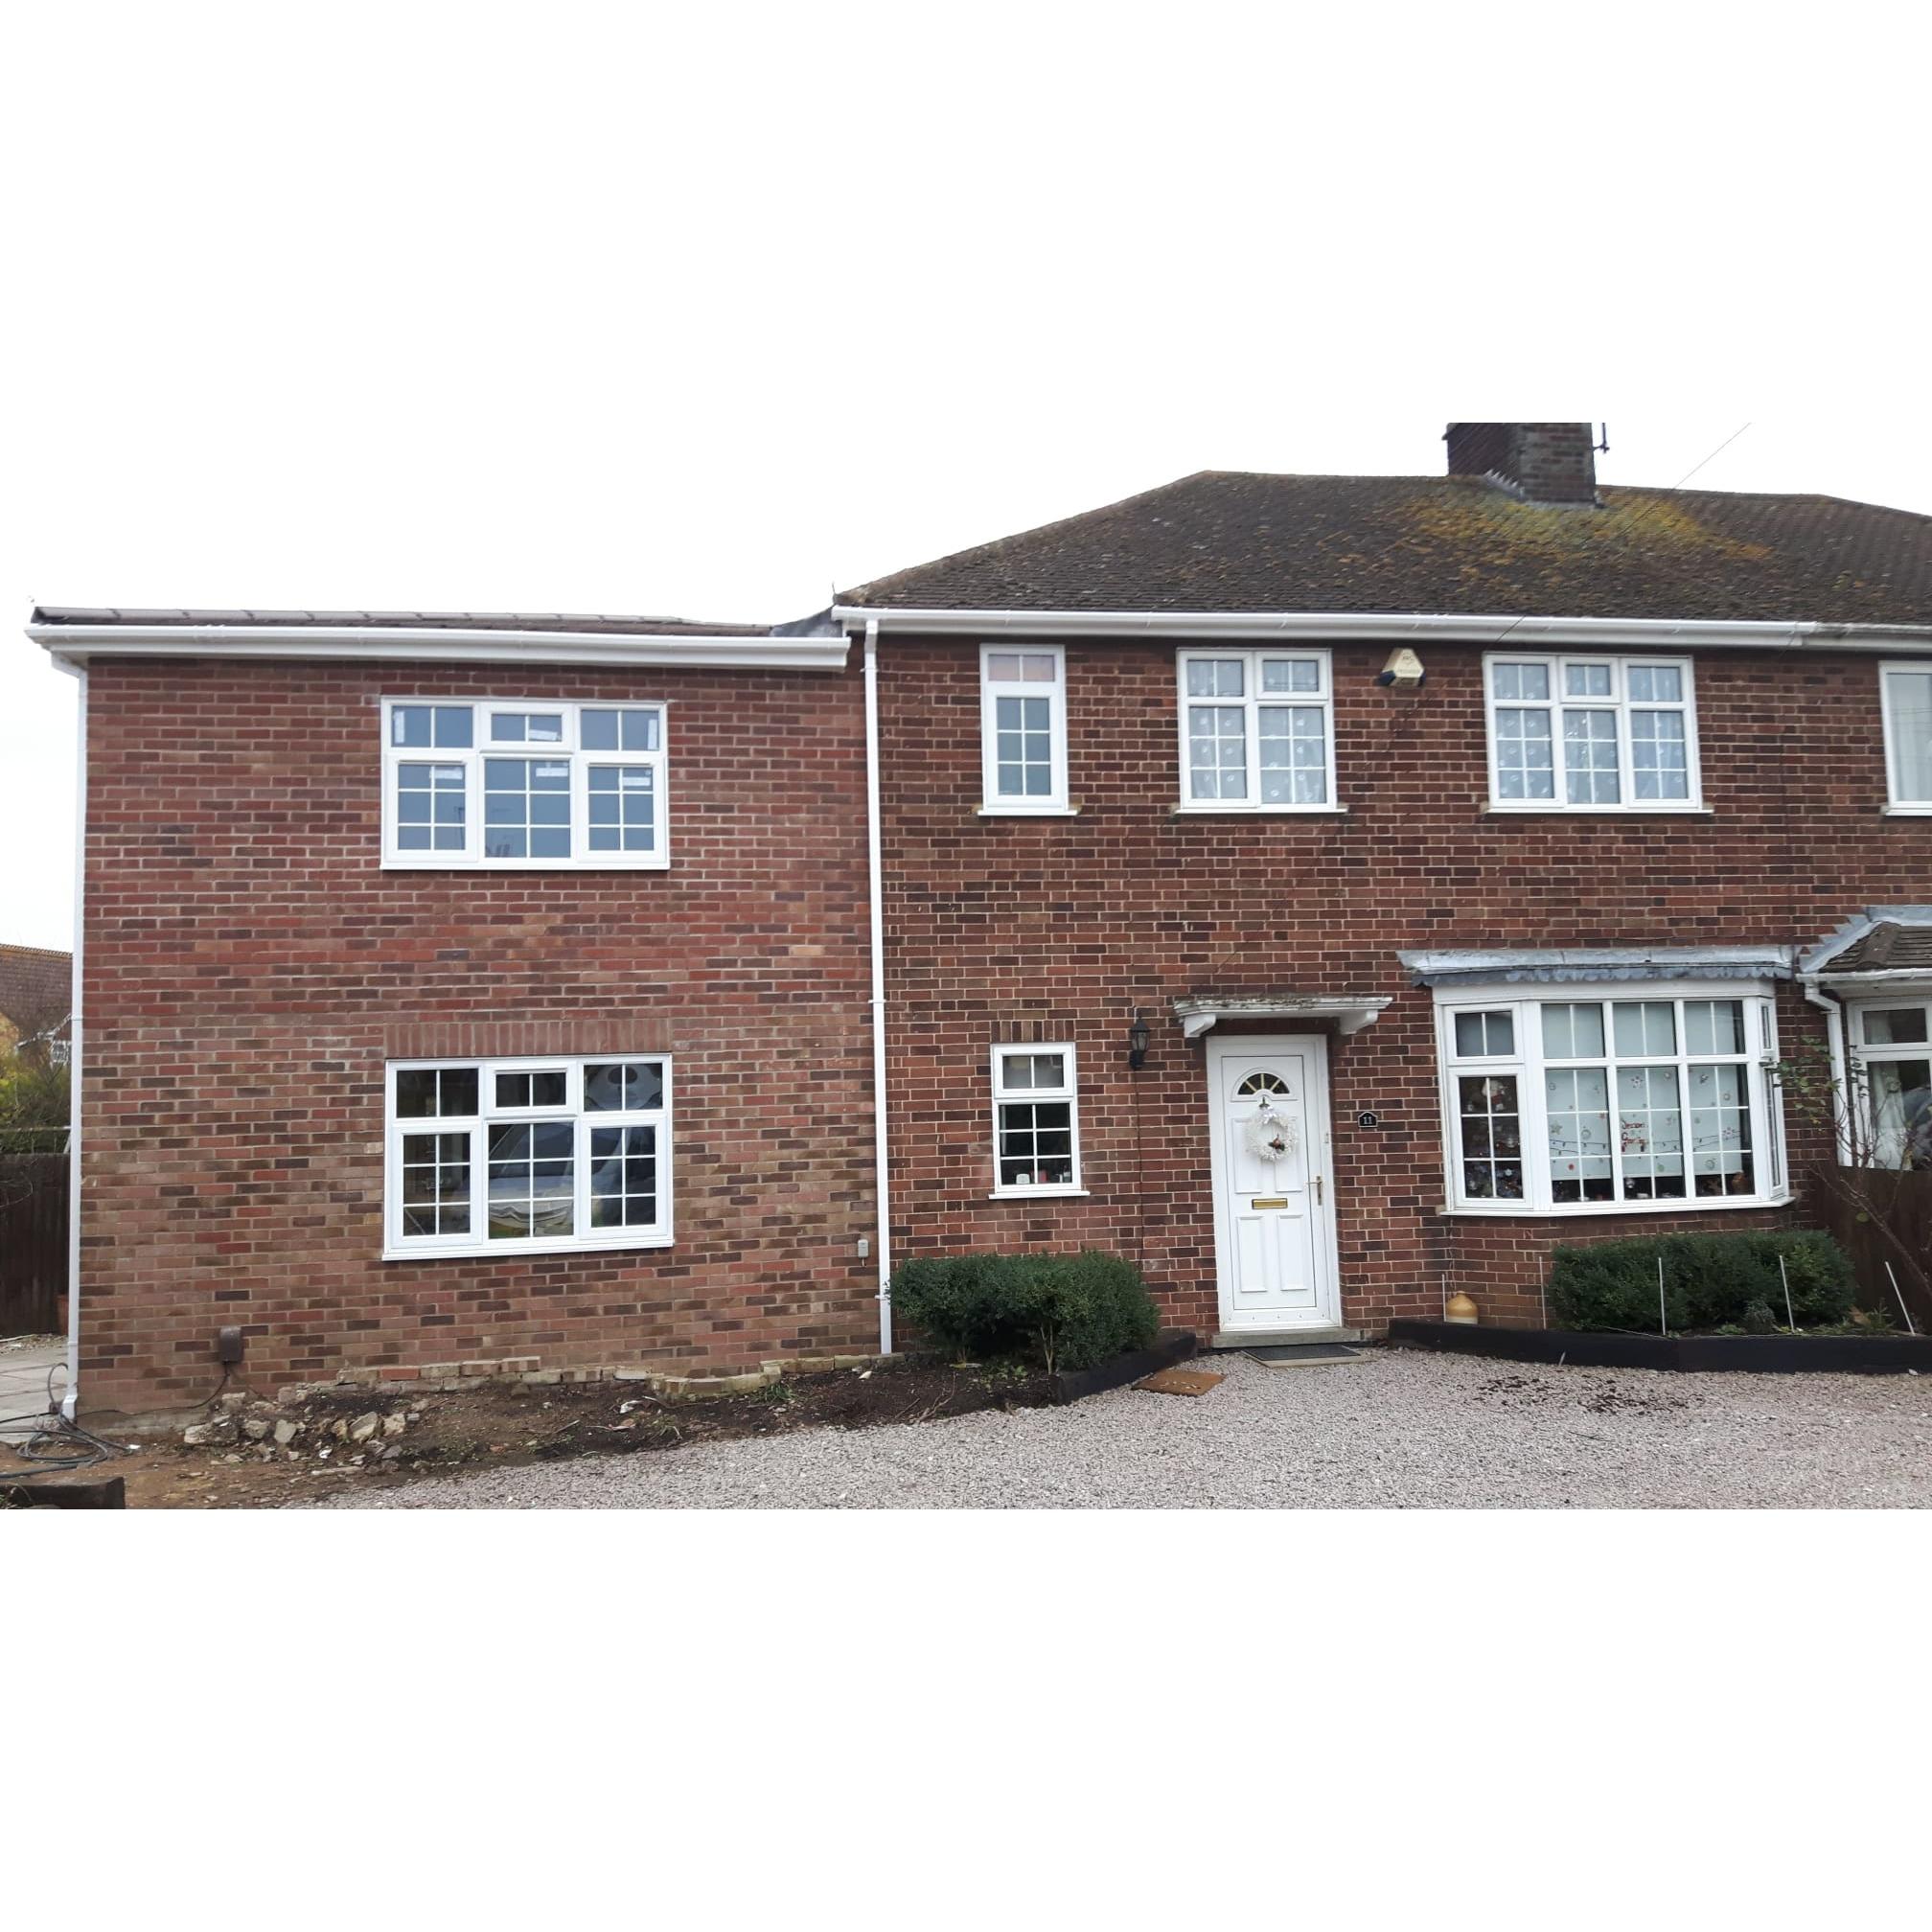 M J Builders - Peterborough, Cambridgeshire PE2 9HP - 01733 759427 | ShowMeLocal.com